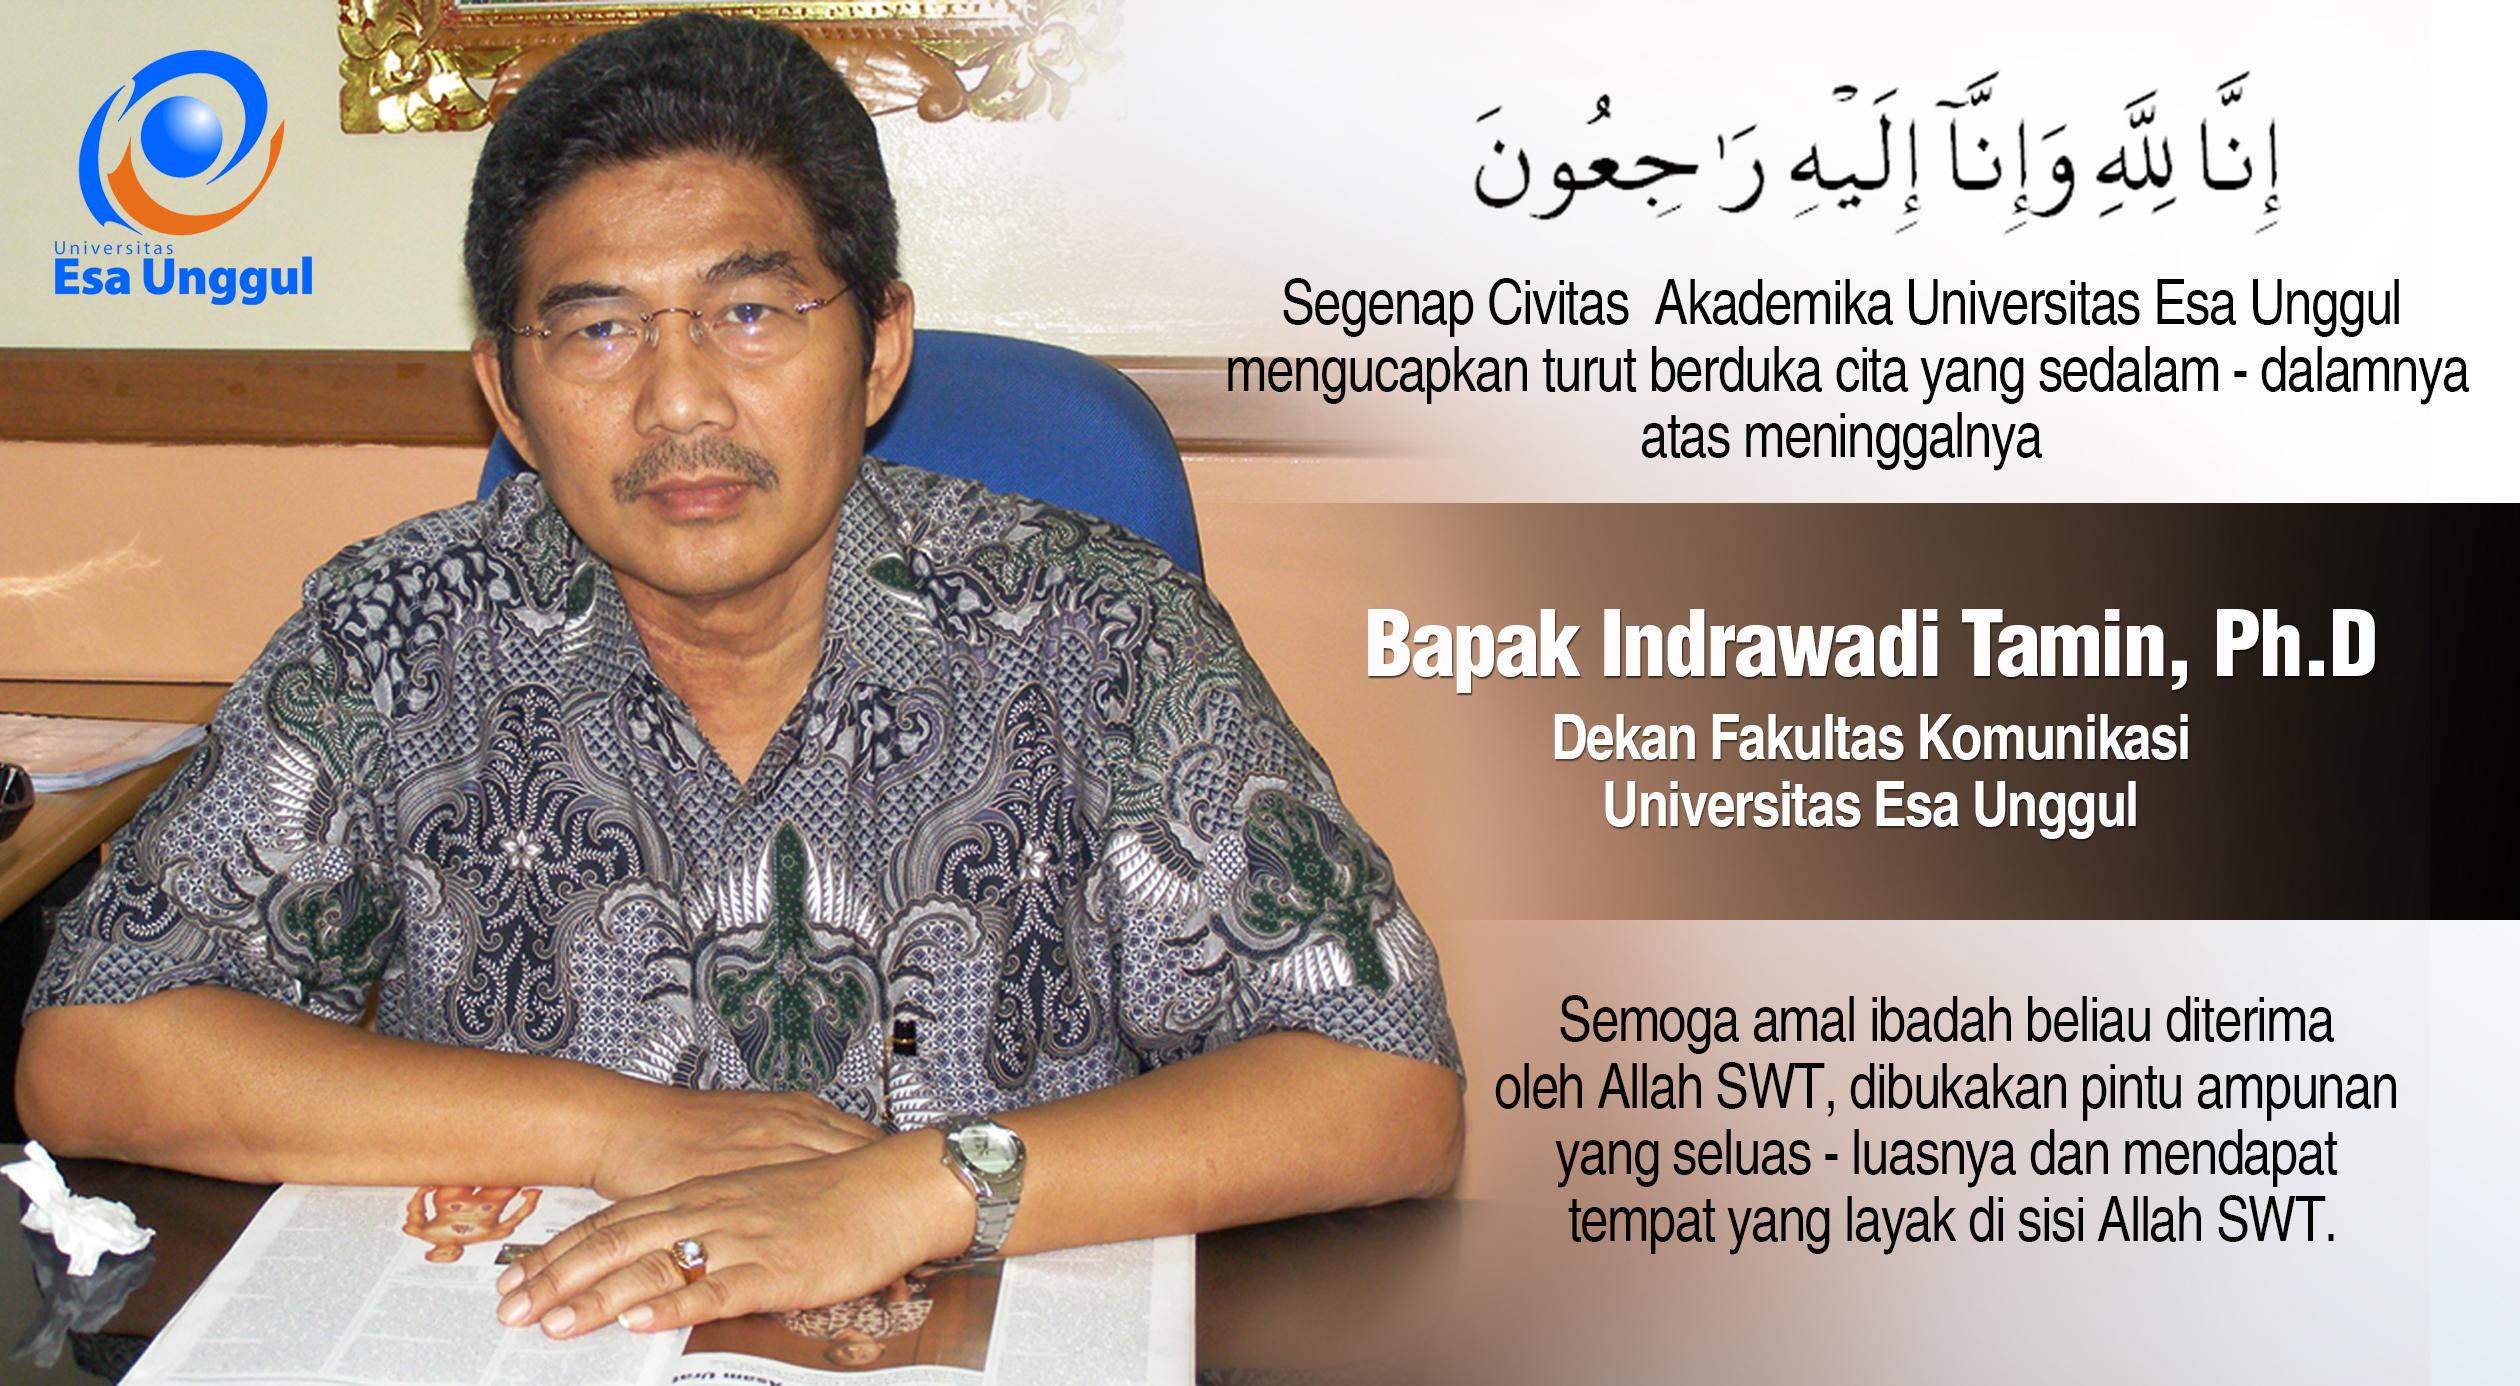 Segenap Civitas akademika Universitas Esa Unggul mengucapkan turut berduka cita yang sedalam-dalamnya atas meninggalnya Bapak INDRAWADI TAMIN, Ph.D  (Dekan FIKOM UEU)